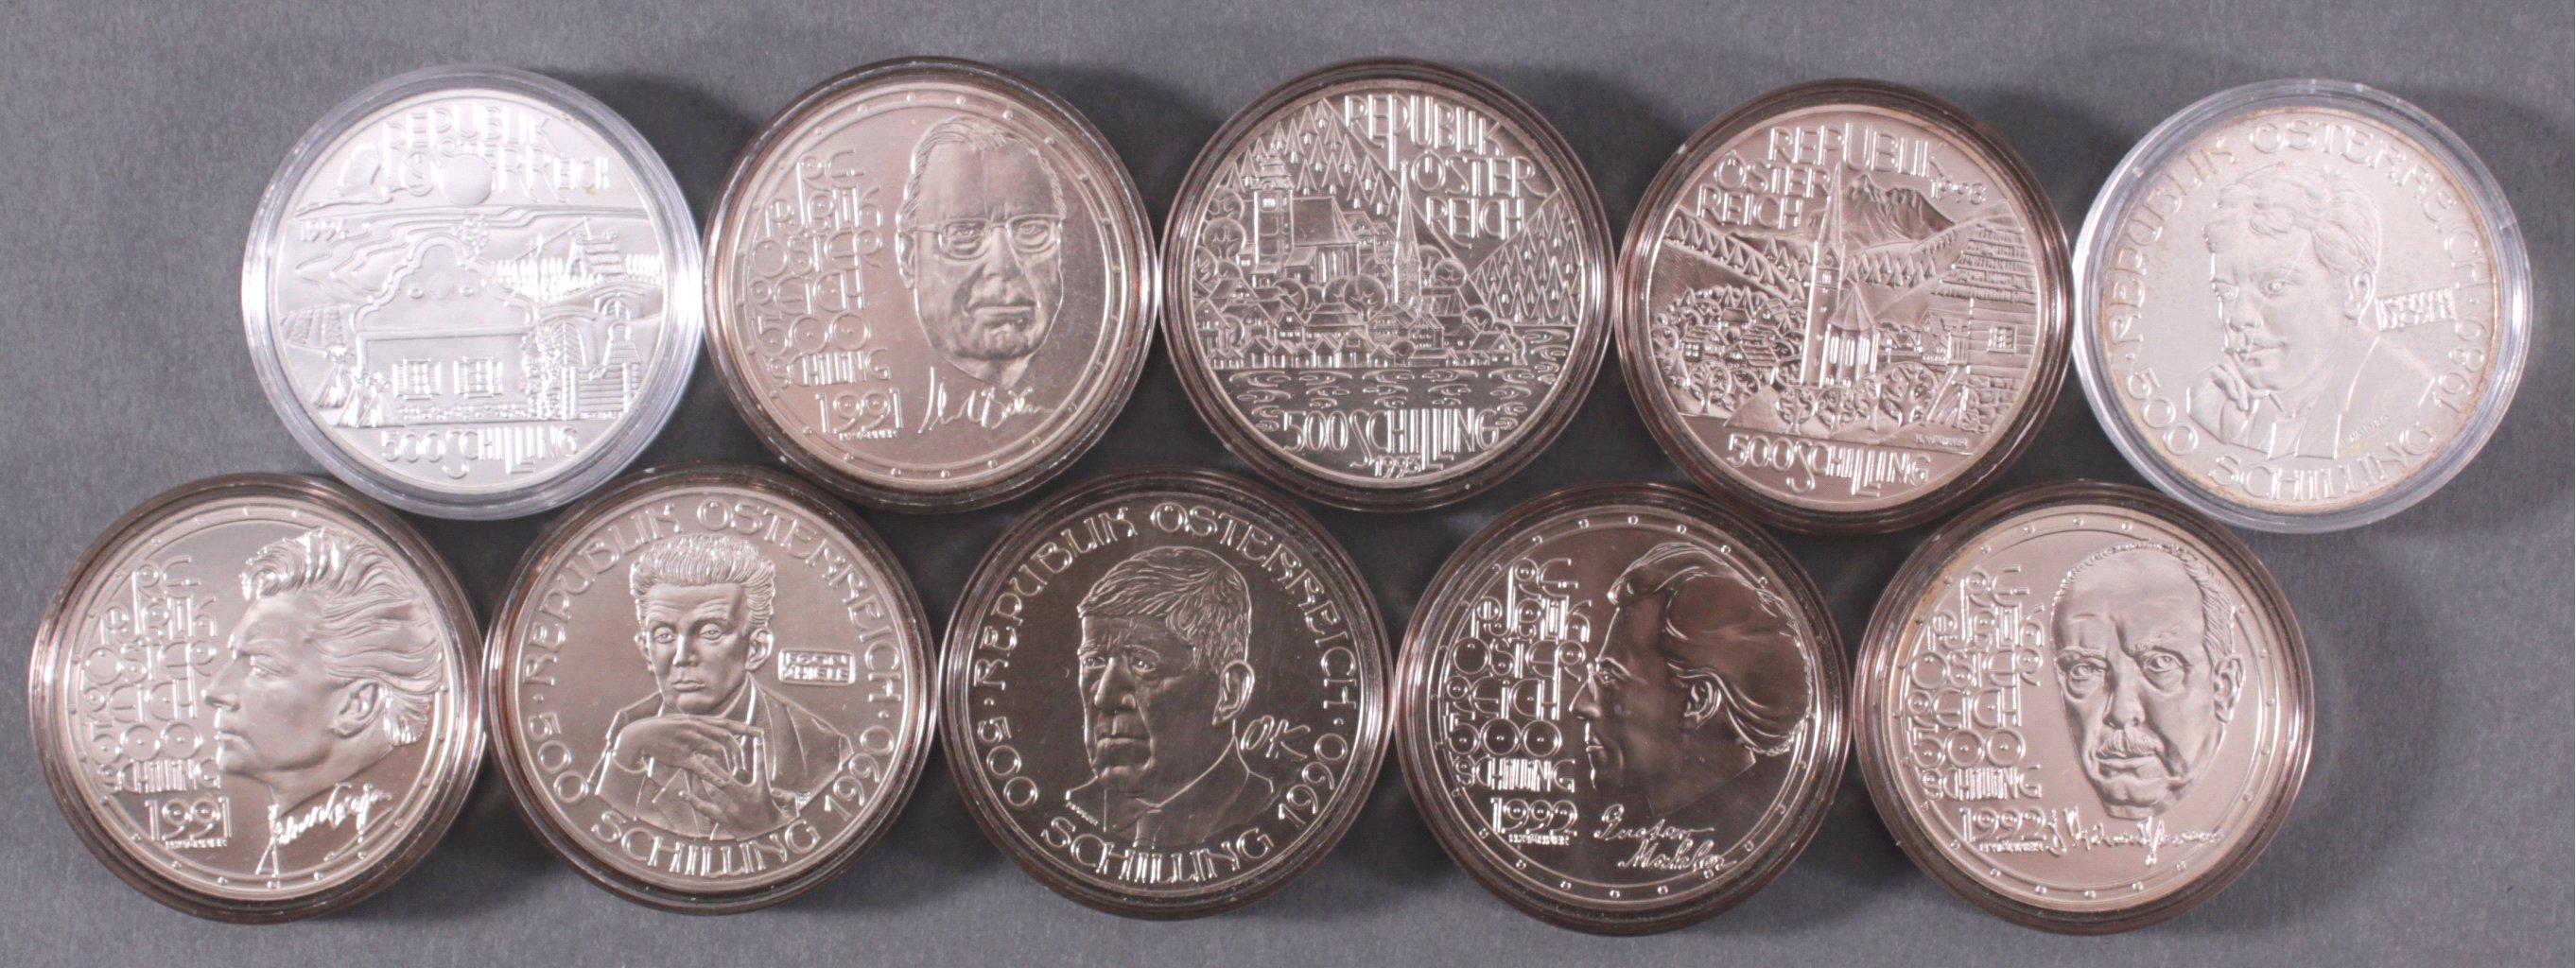 10x 500 Schilling Münzen